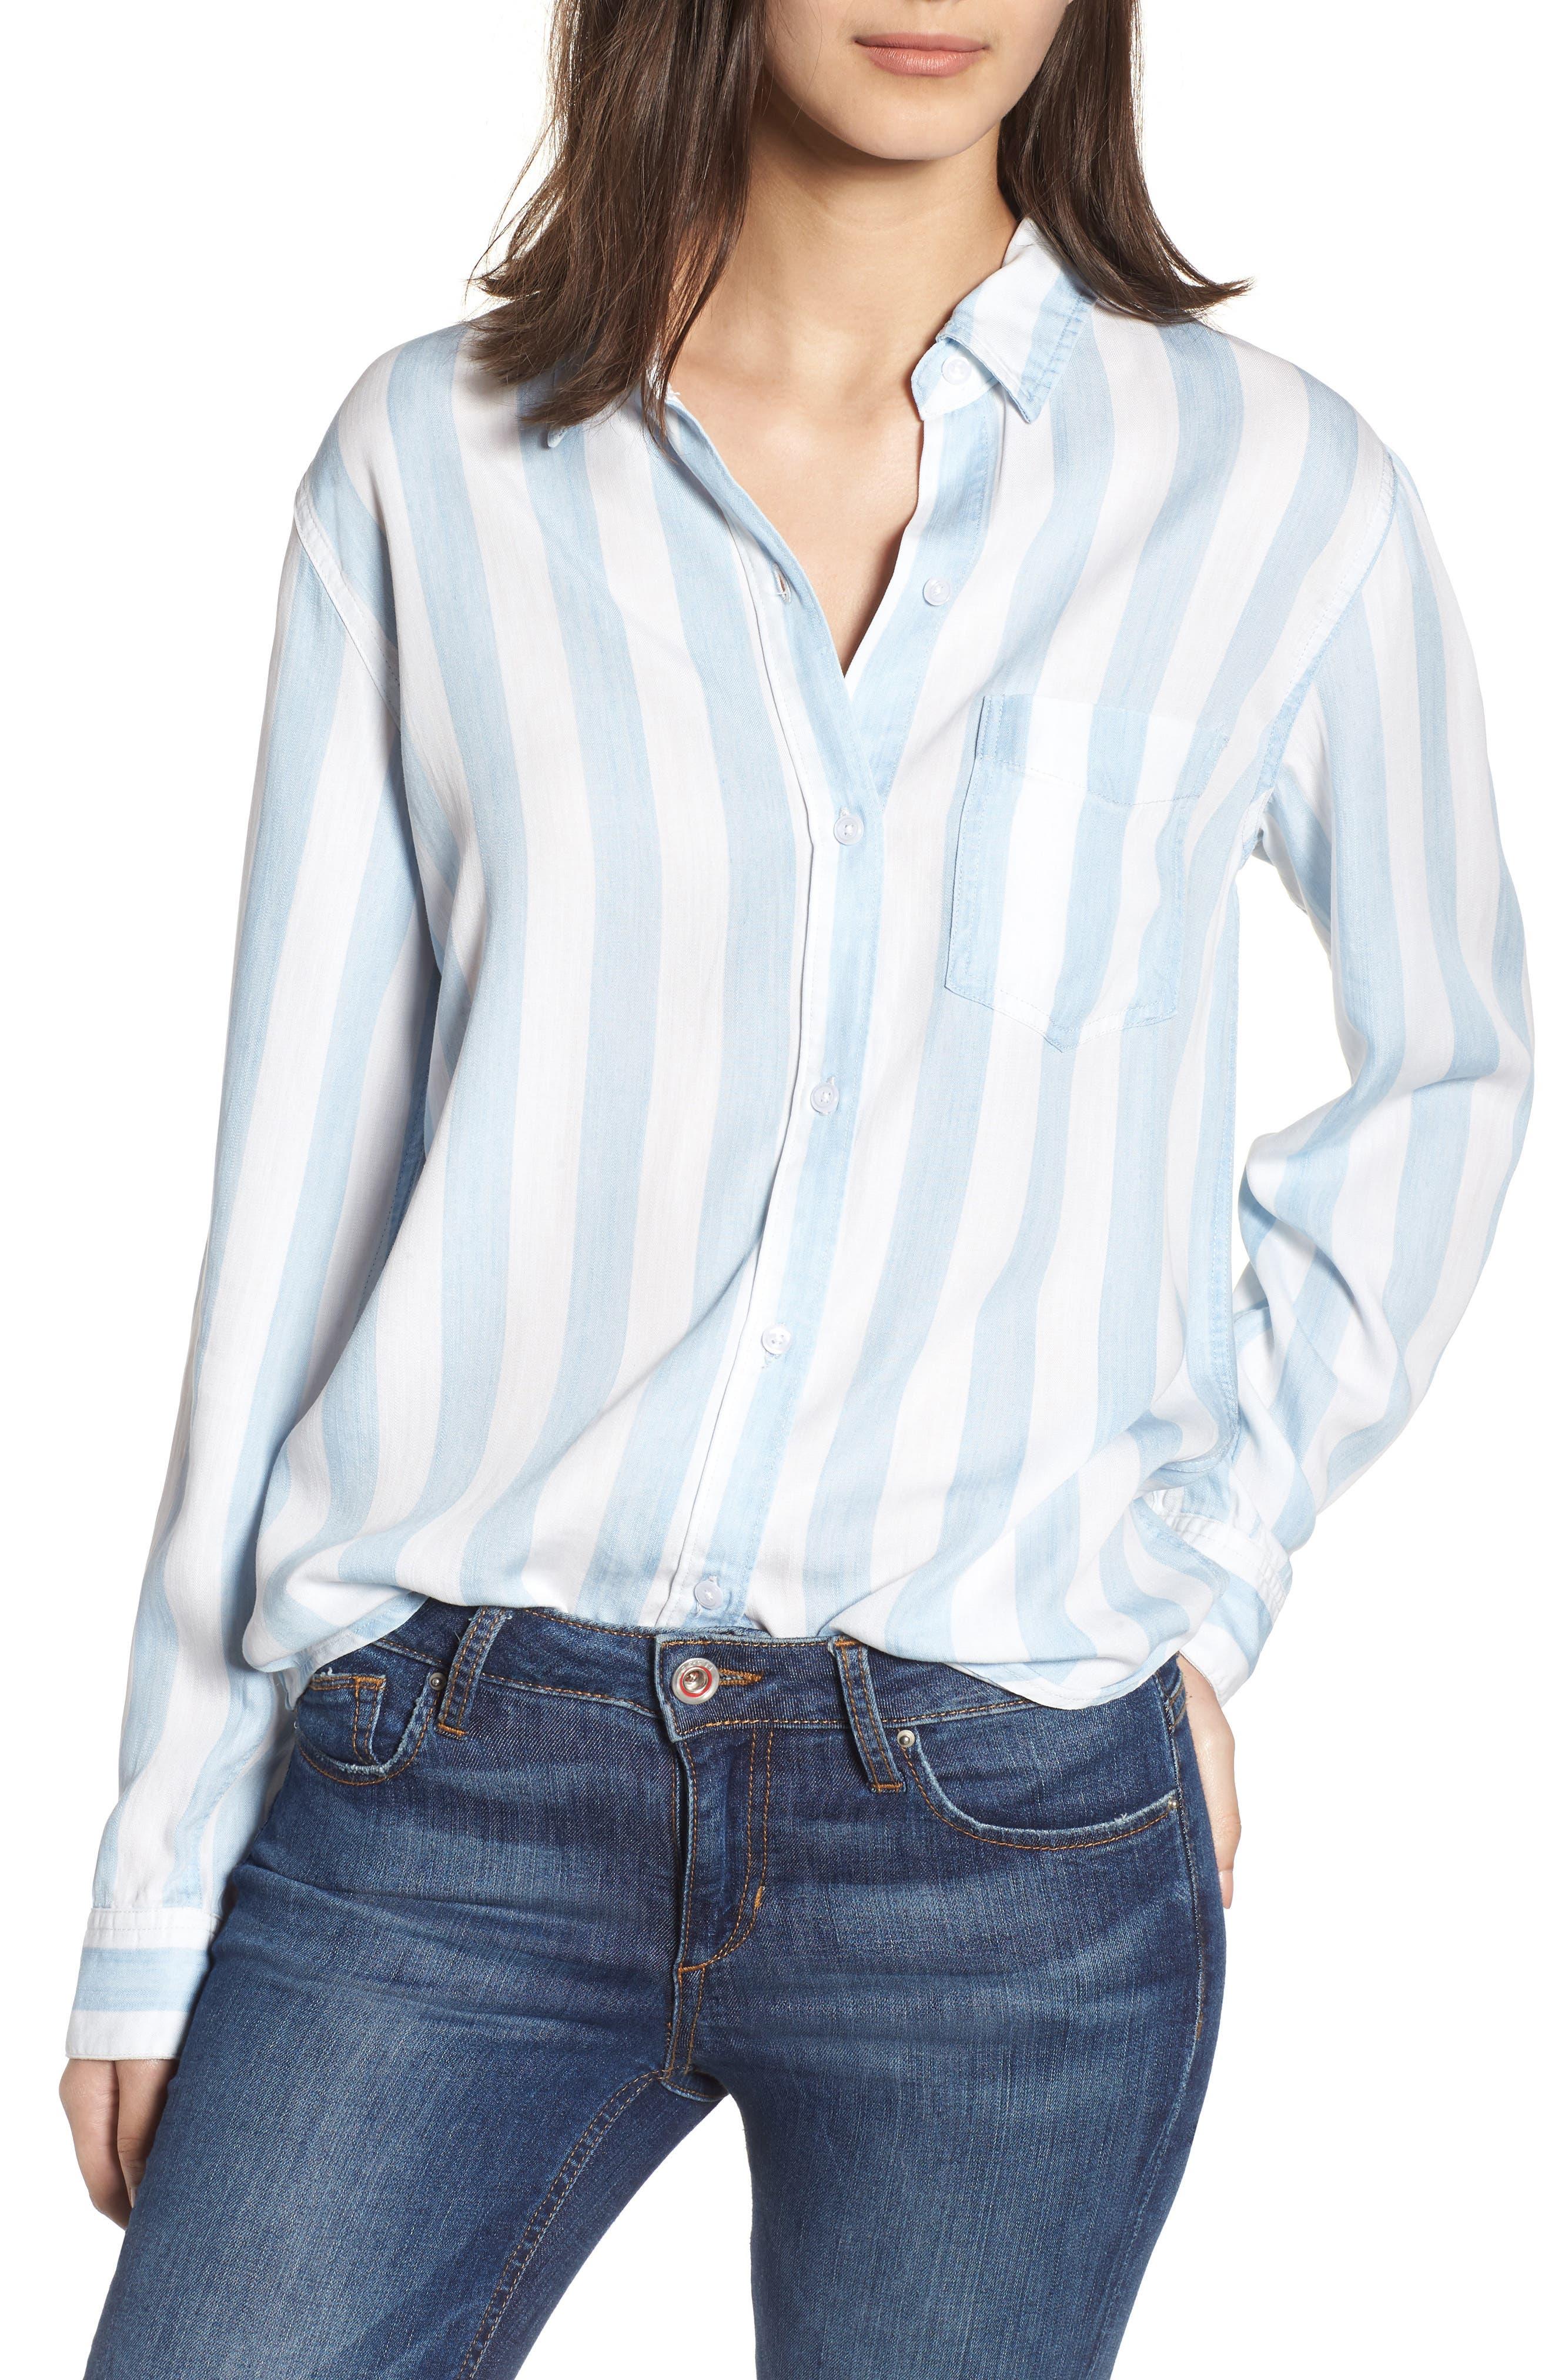 Ingrid Stripe Chambray Shirt,                         Main,                         color, 152